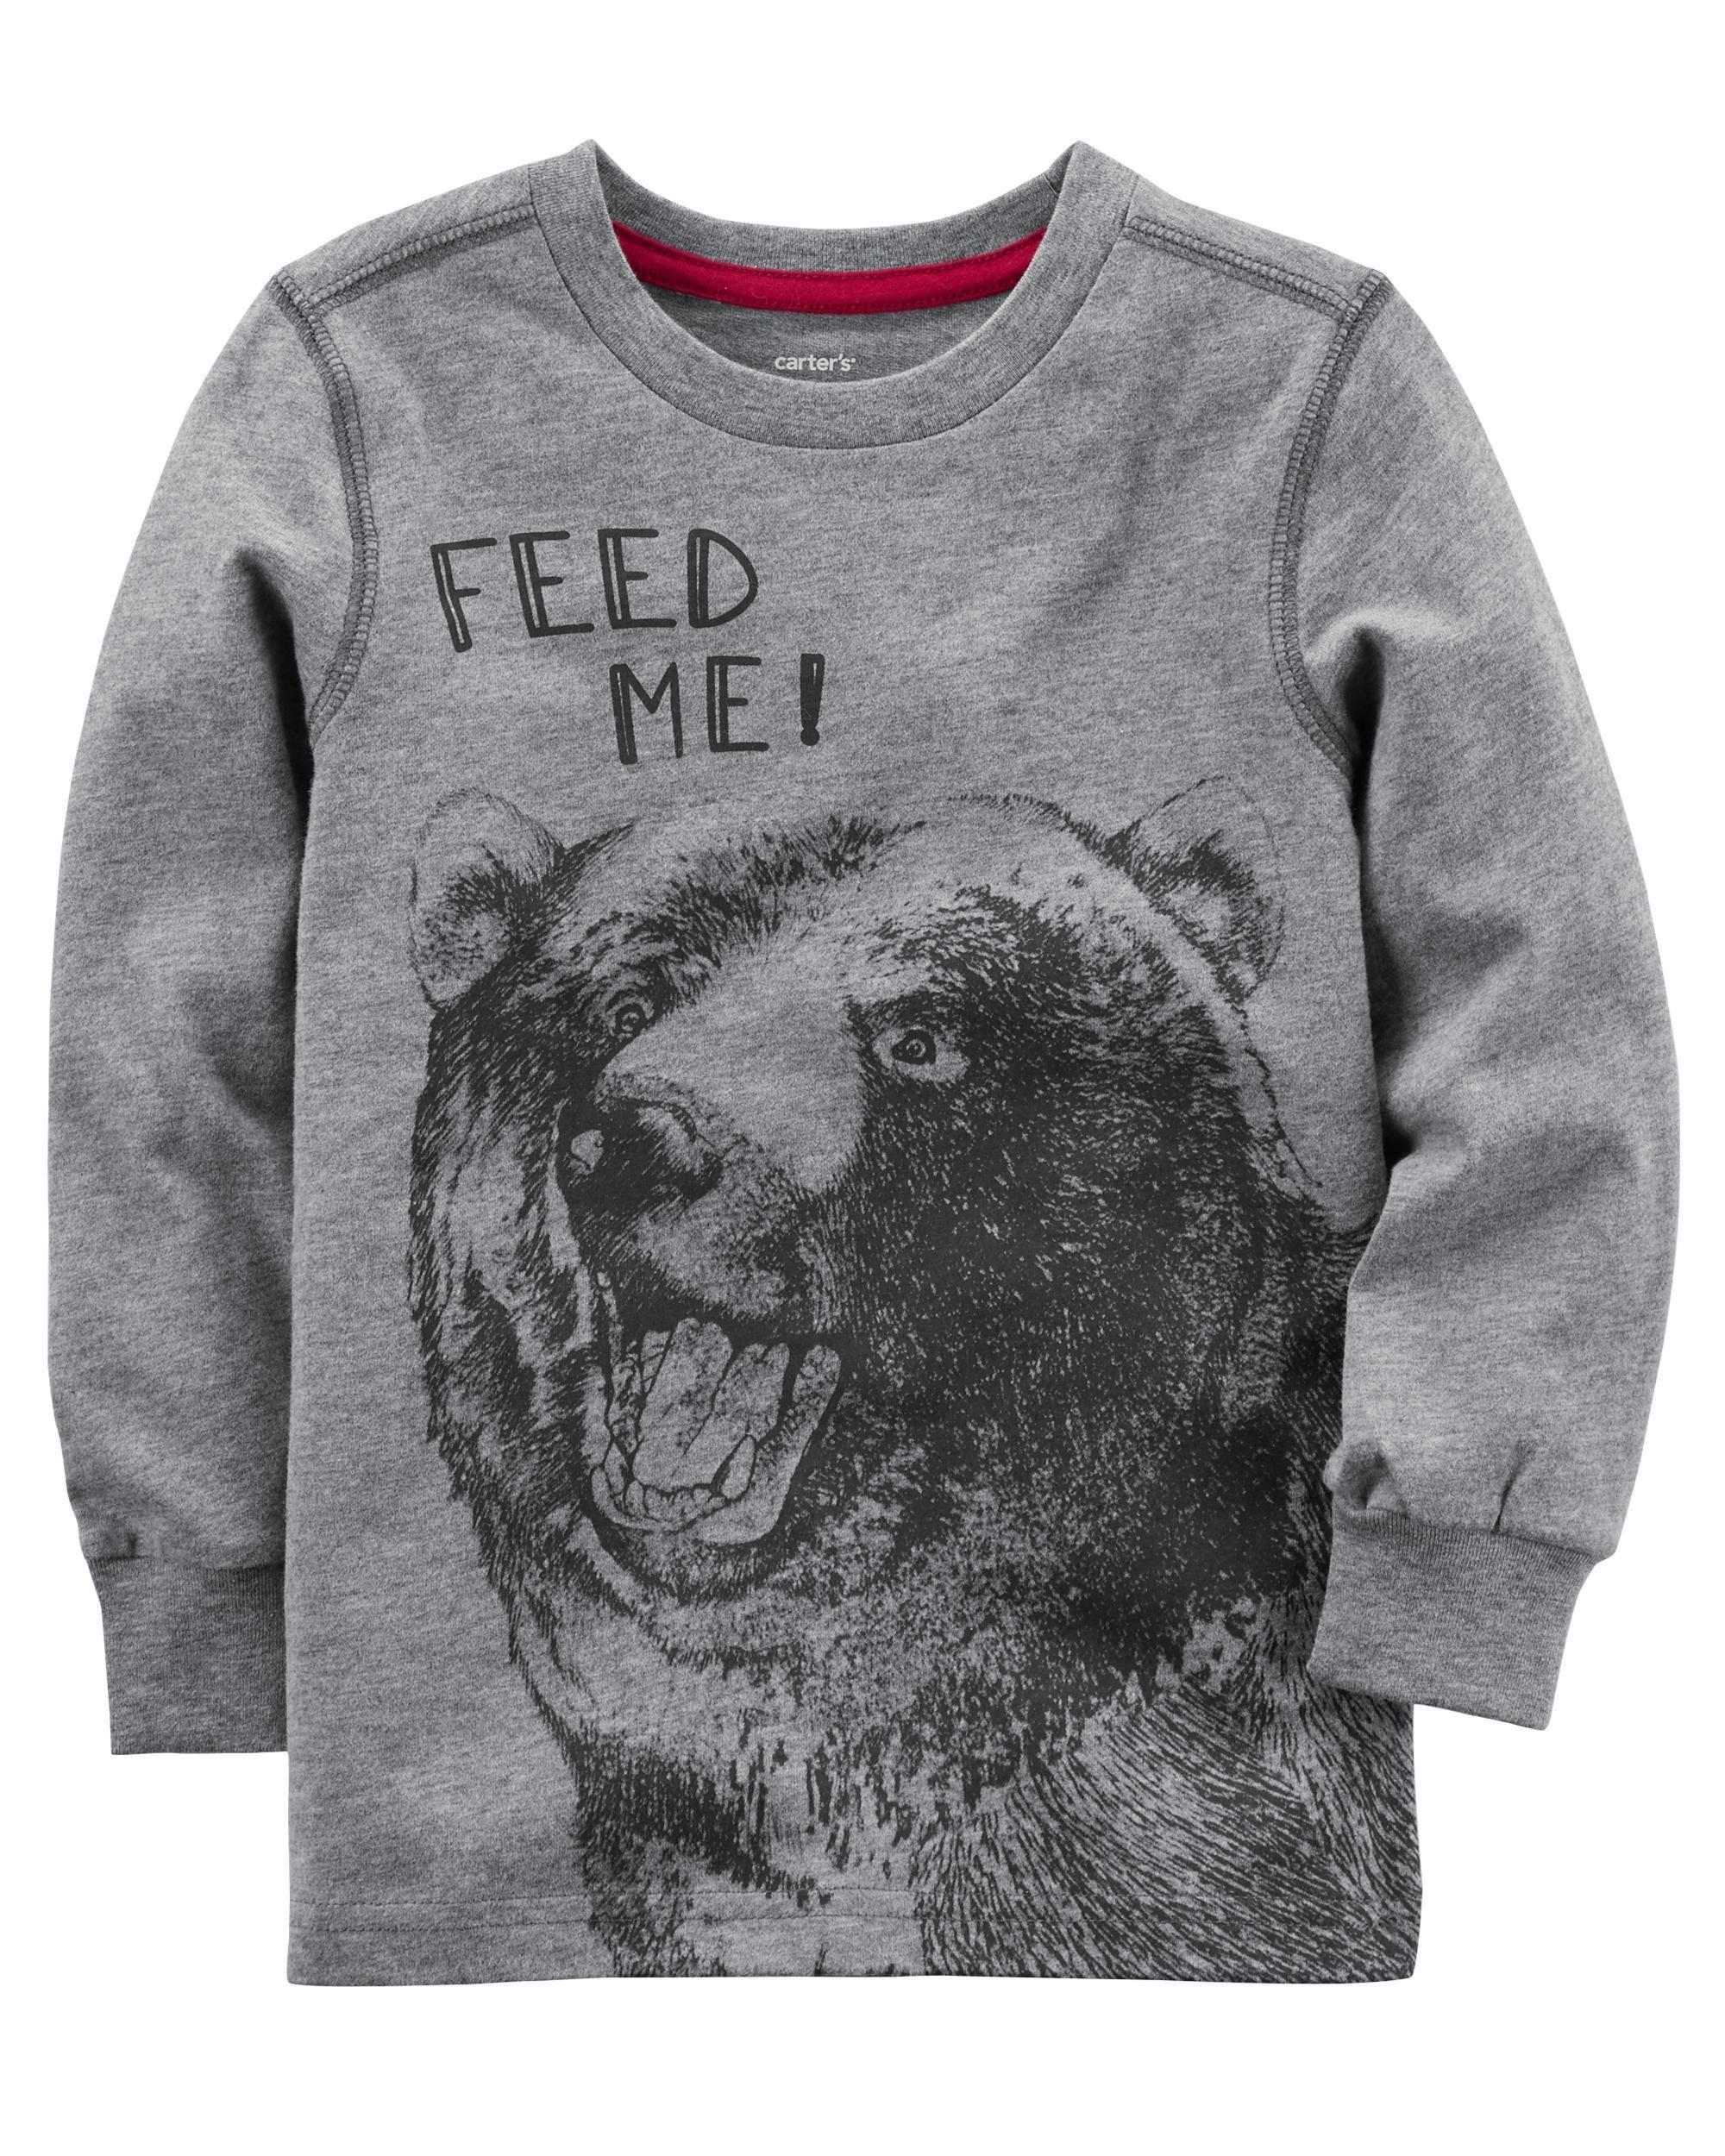 a2543bae Bear Graphic Tee   Lucas   Long sleeve tops, Boys shirts, Shirts